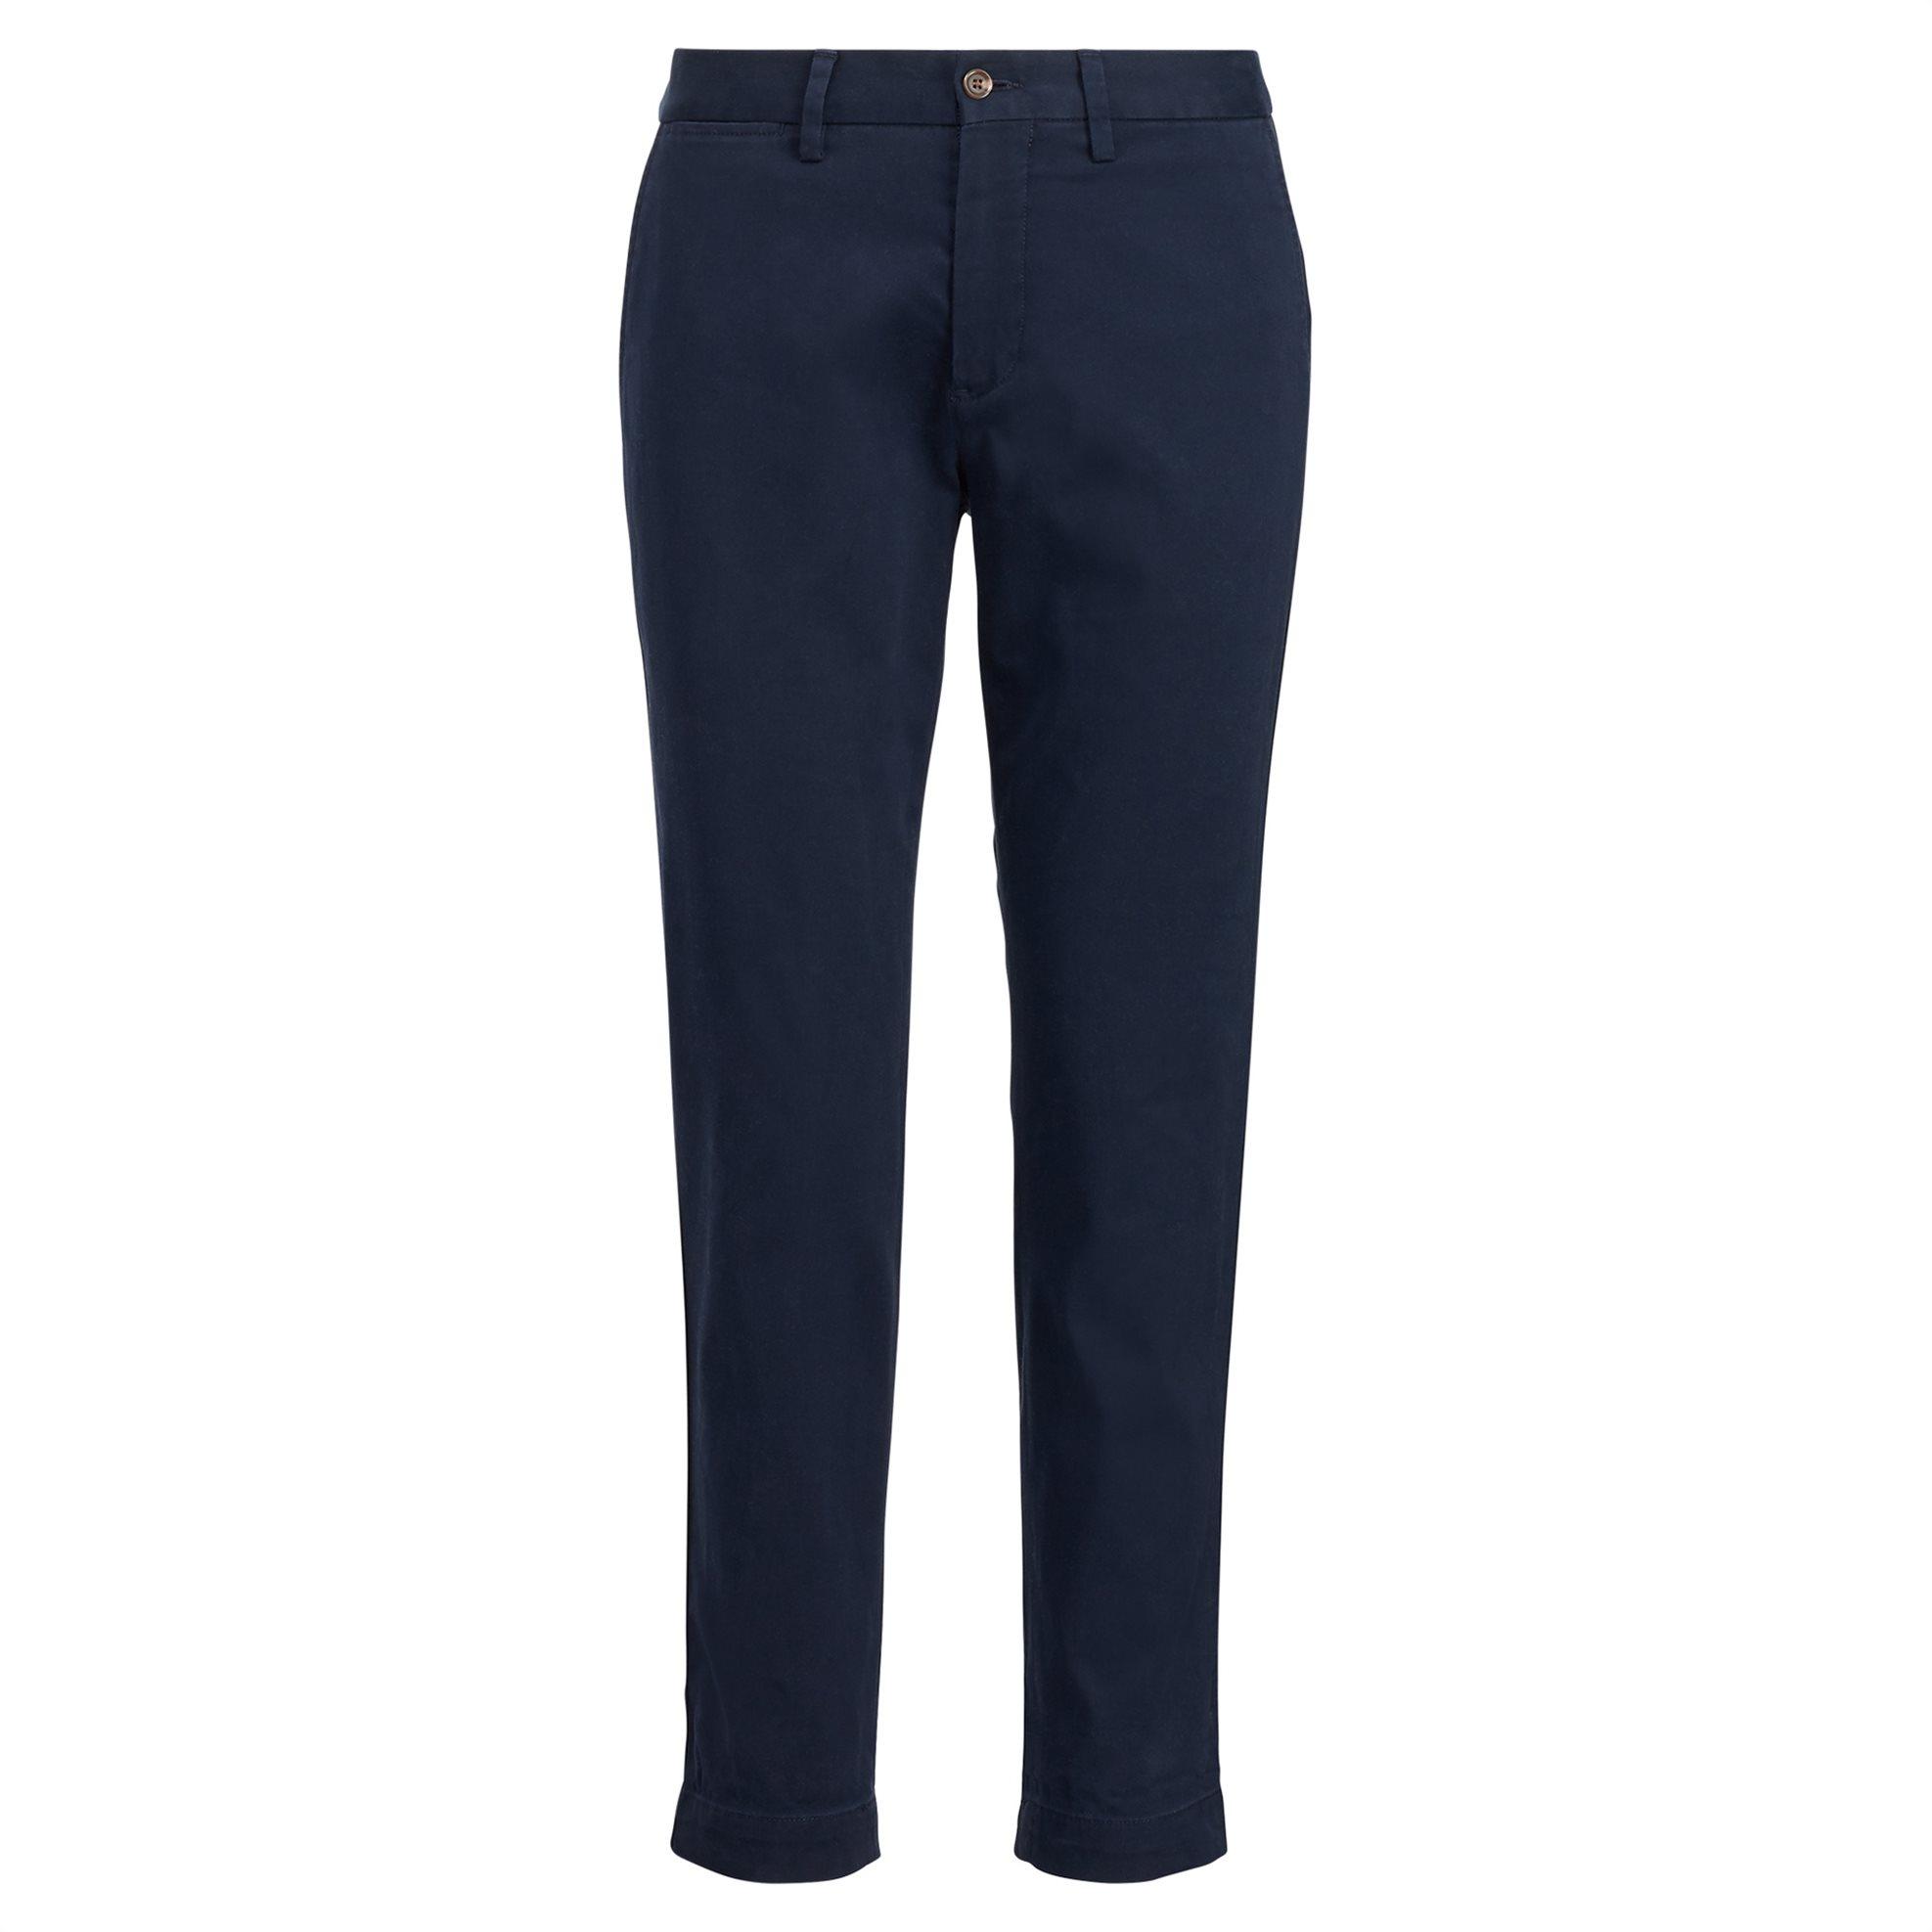 Polo Ralph Lauren γυναικείο παντελόνι Stretch Cotton Straight Pant Aviator Navy  γυναικα   ρουχα   παντελόνια   chinos